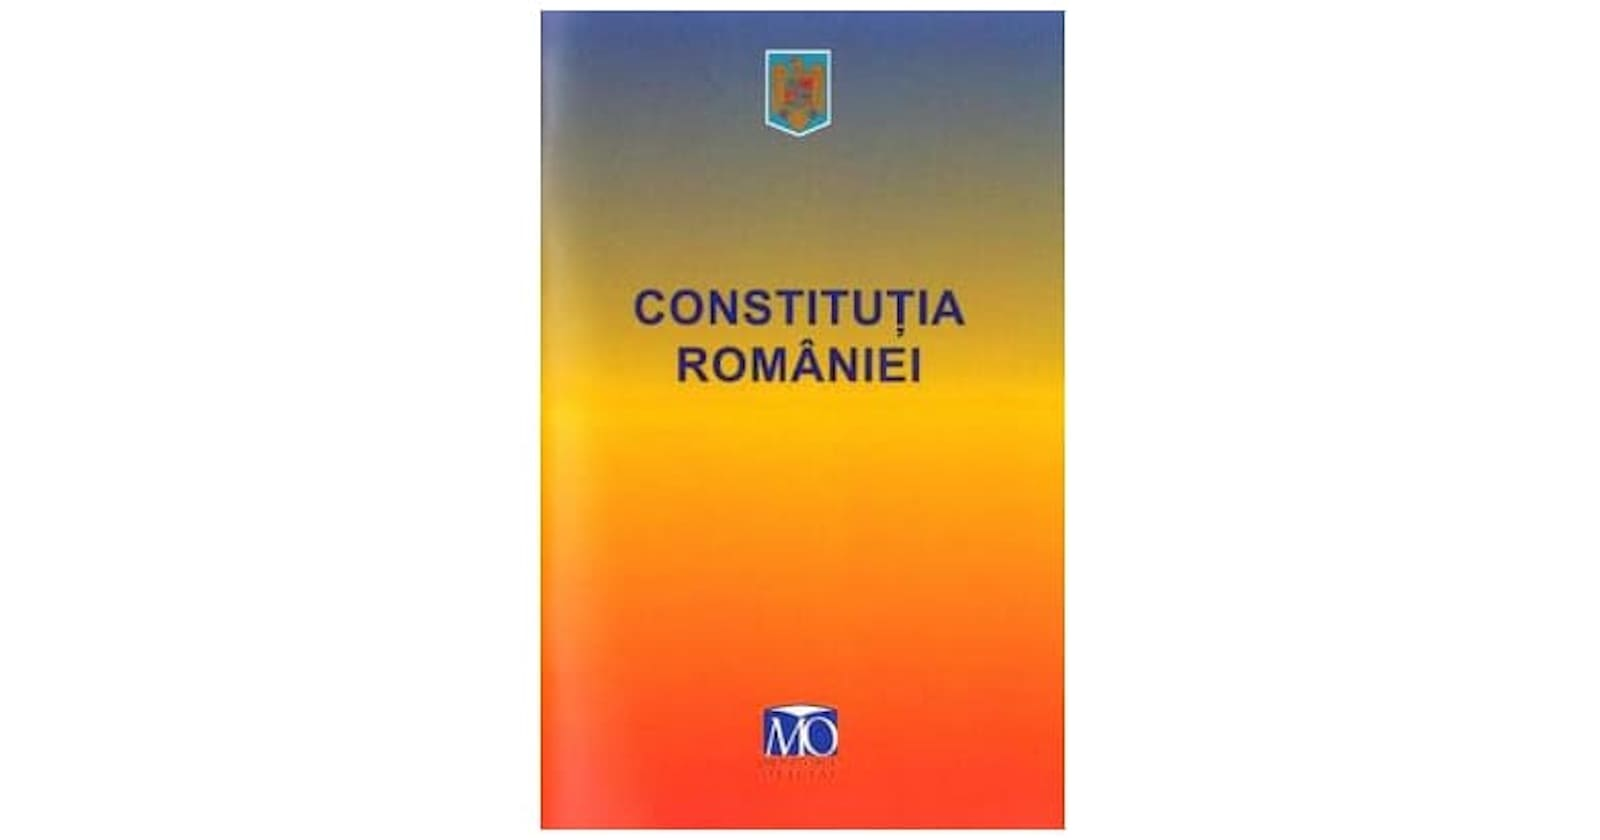 https://ziarul.romania-rationala.ro/control/articole/articole/constitutia-romaniei.jpg